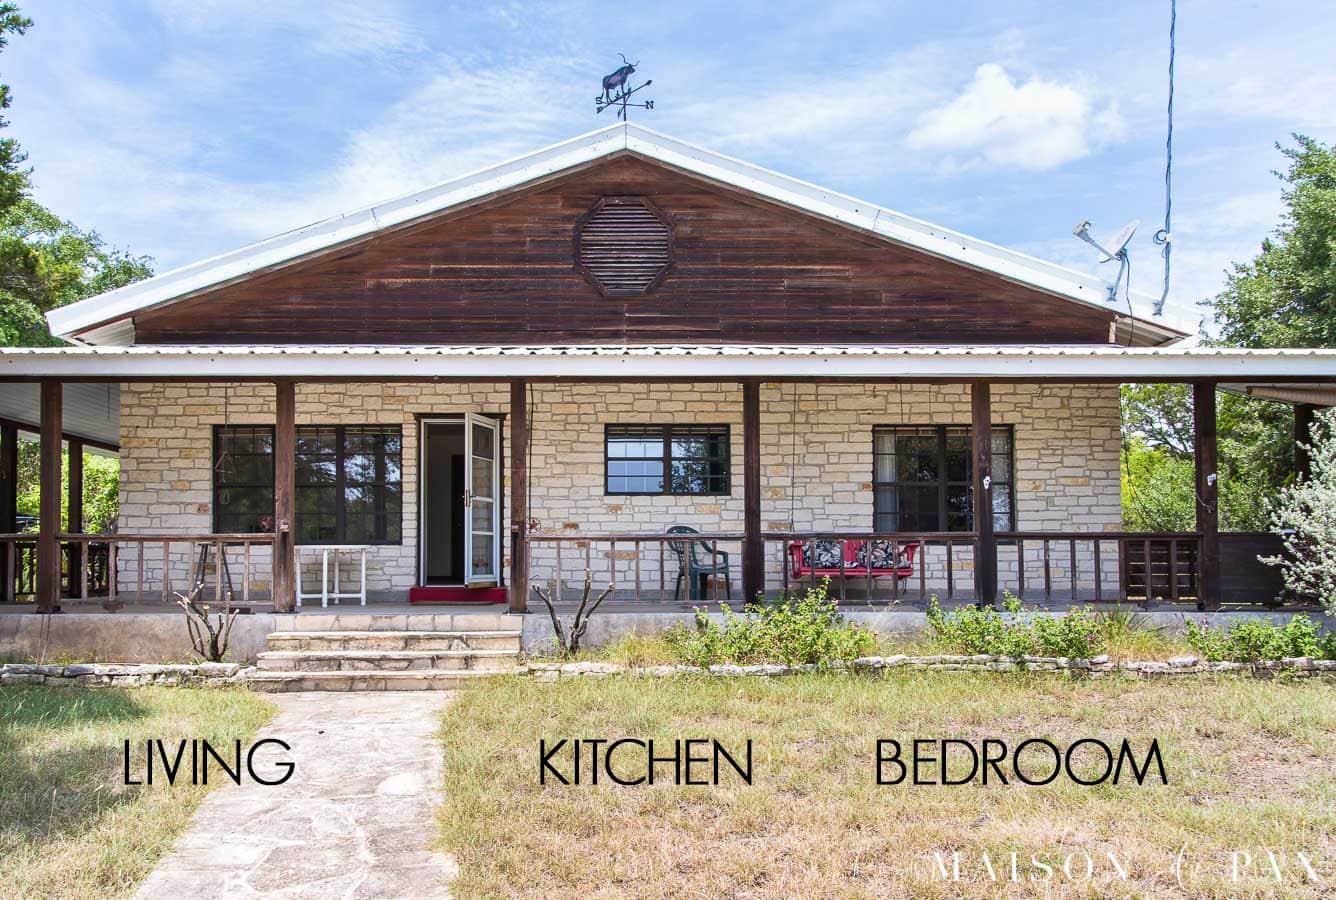 Modern Farmhouse Kitchen Design Ideas- Maison de Pax